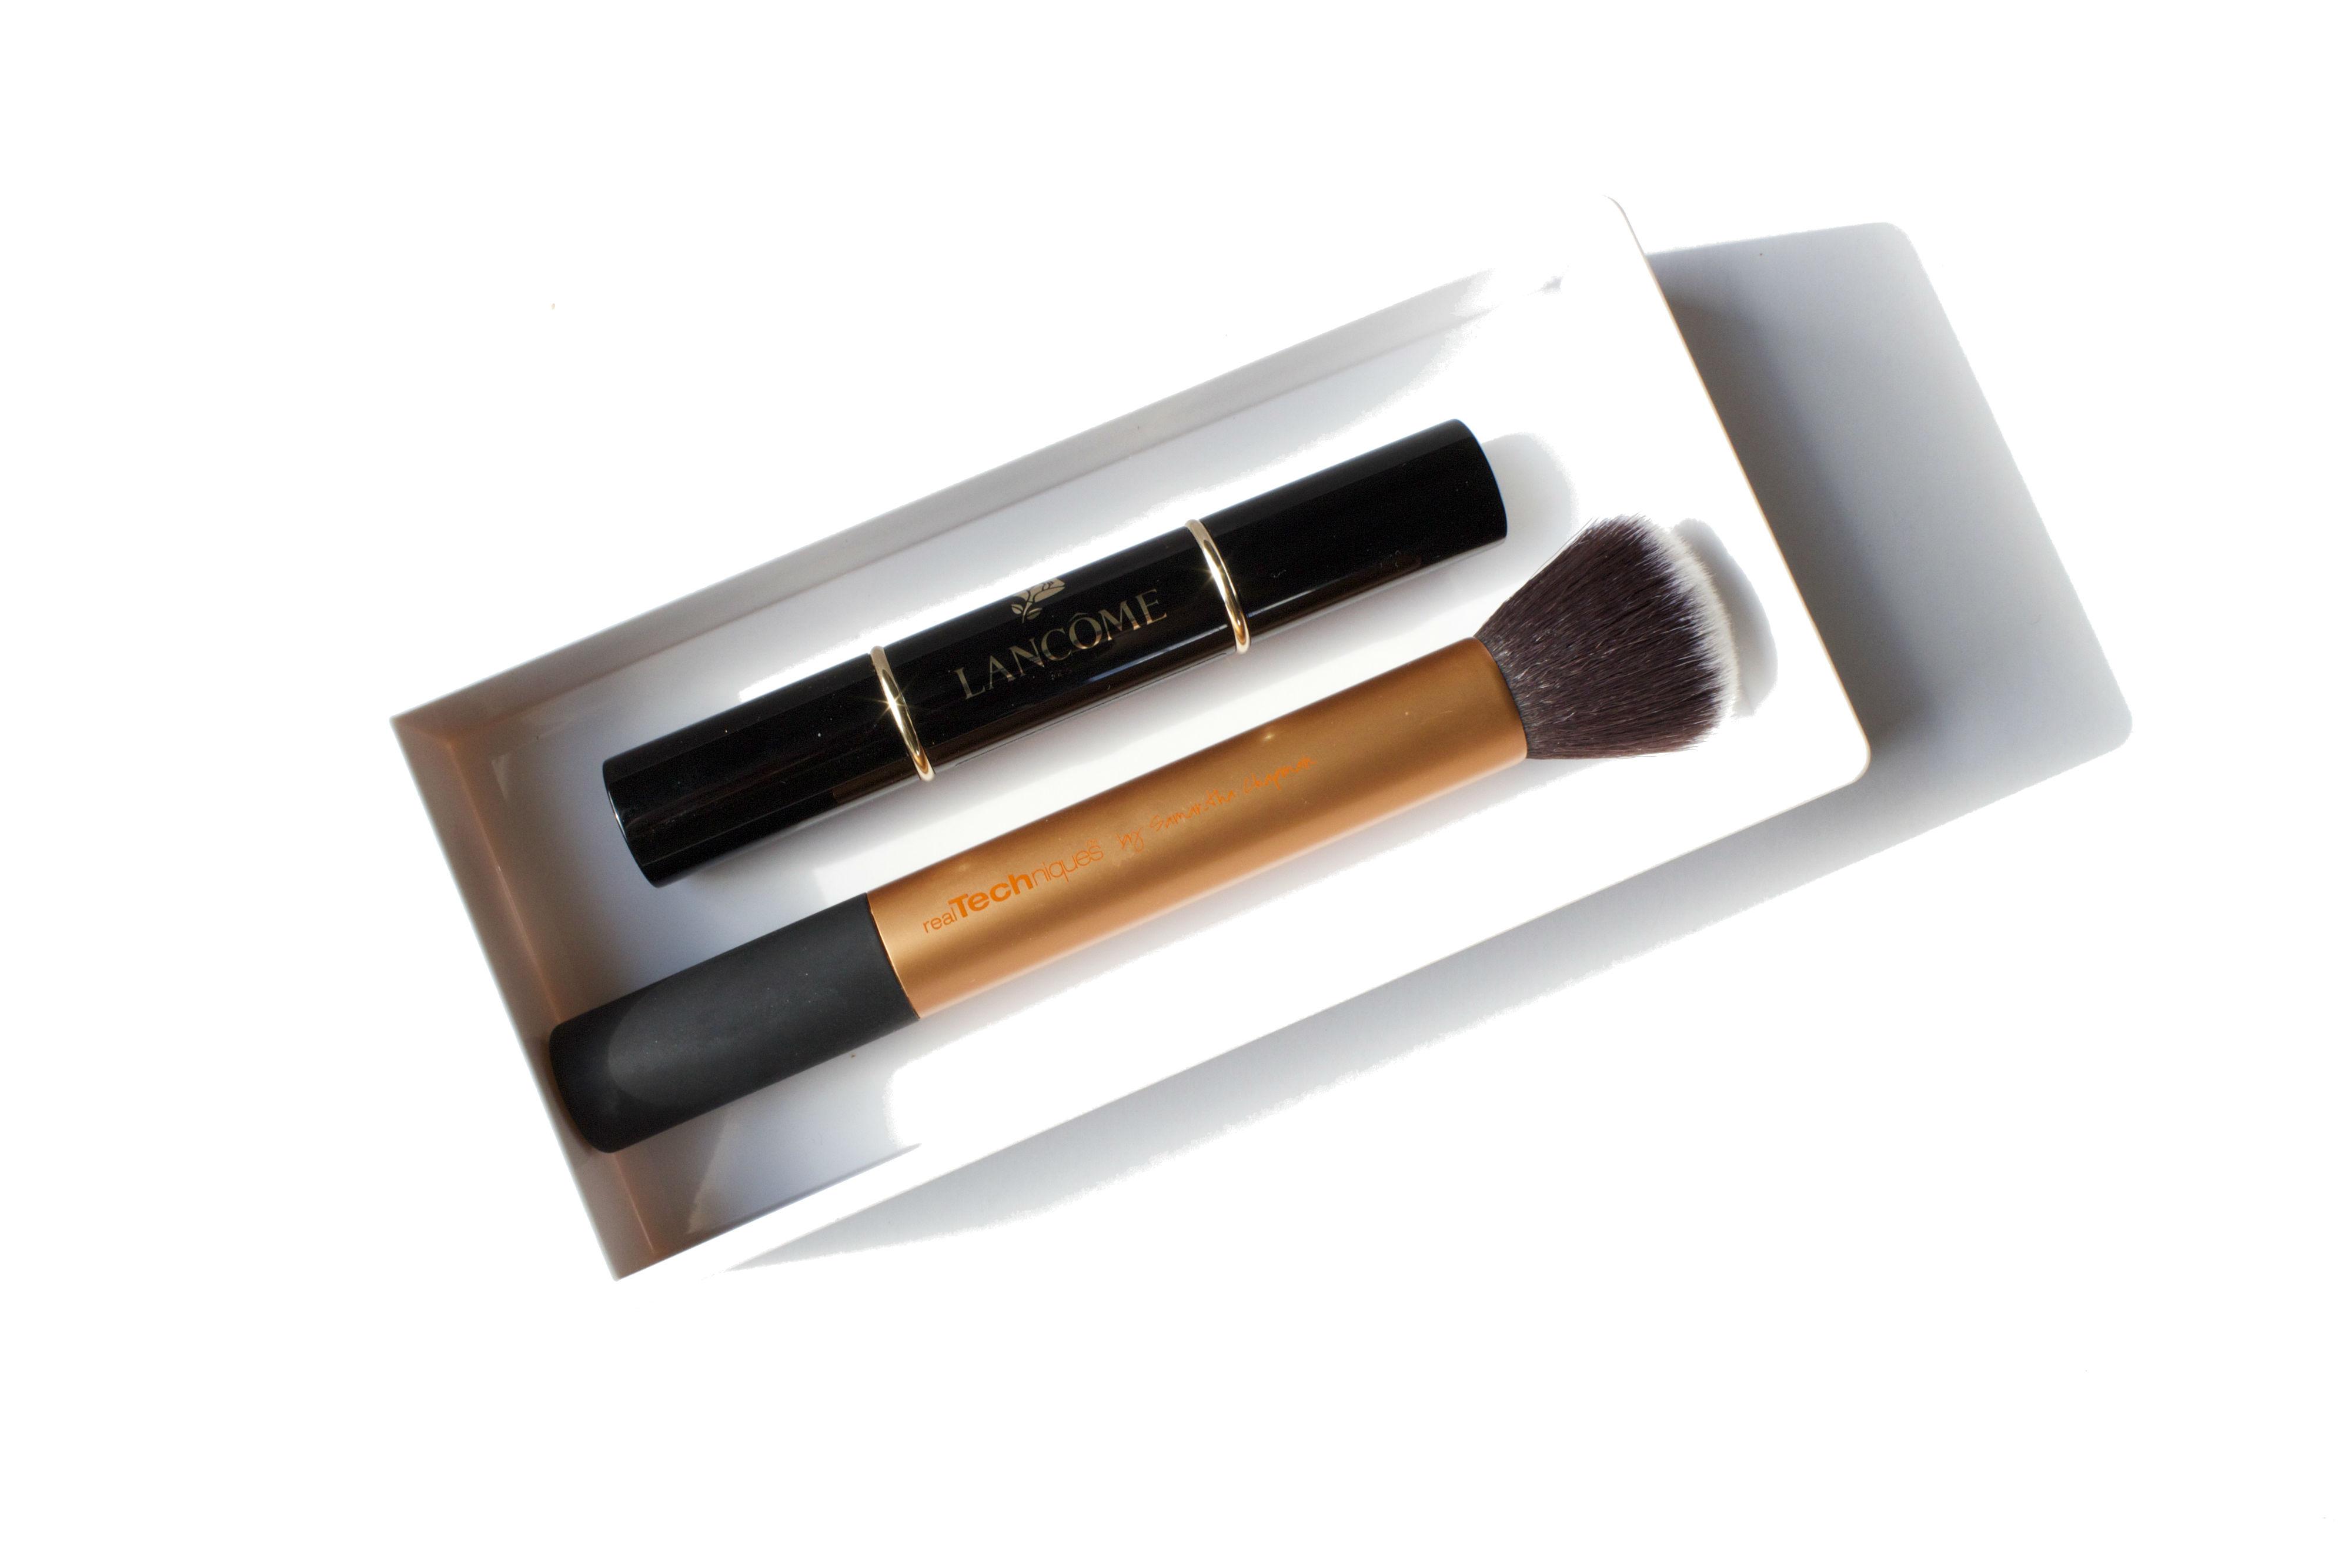 Lancôme LE DUO - Contour & Highlighter Stick Review Brighterdarling.com